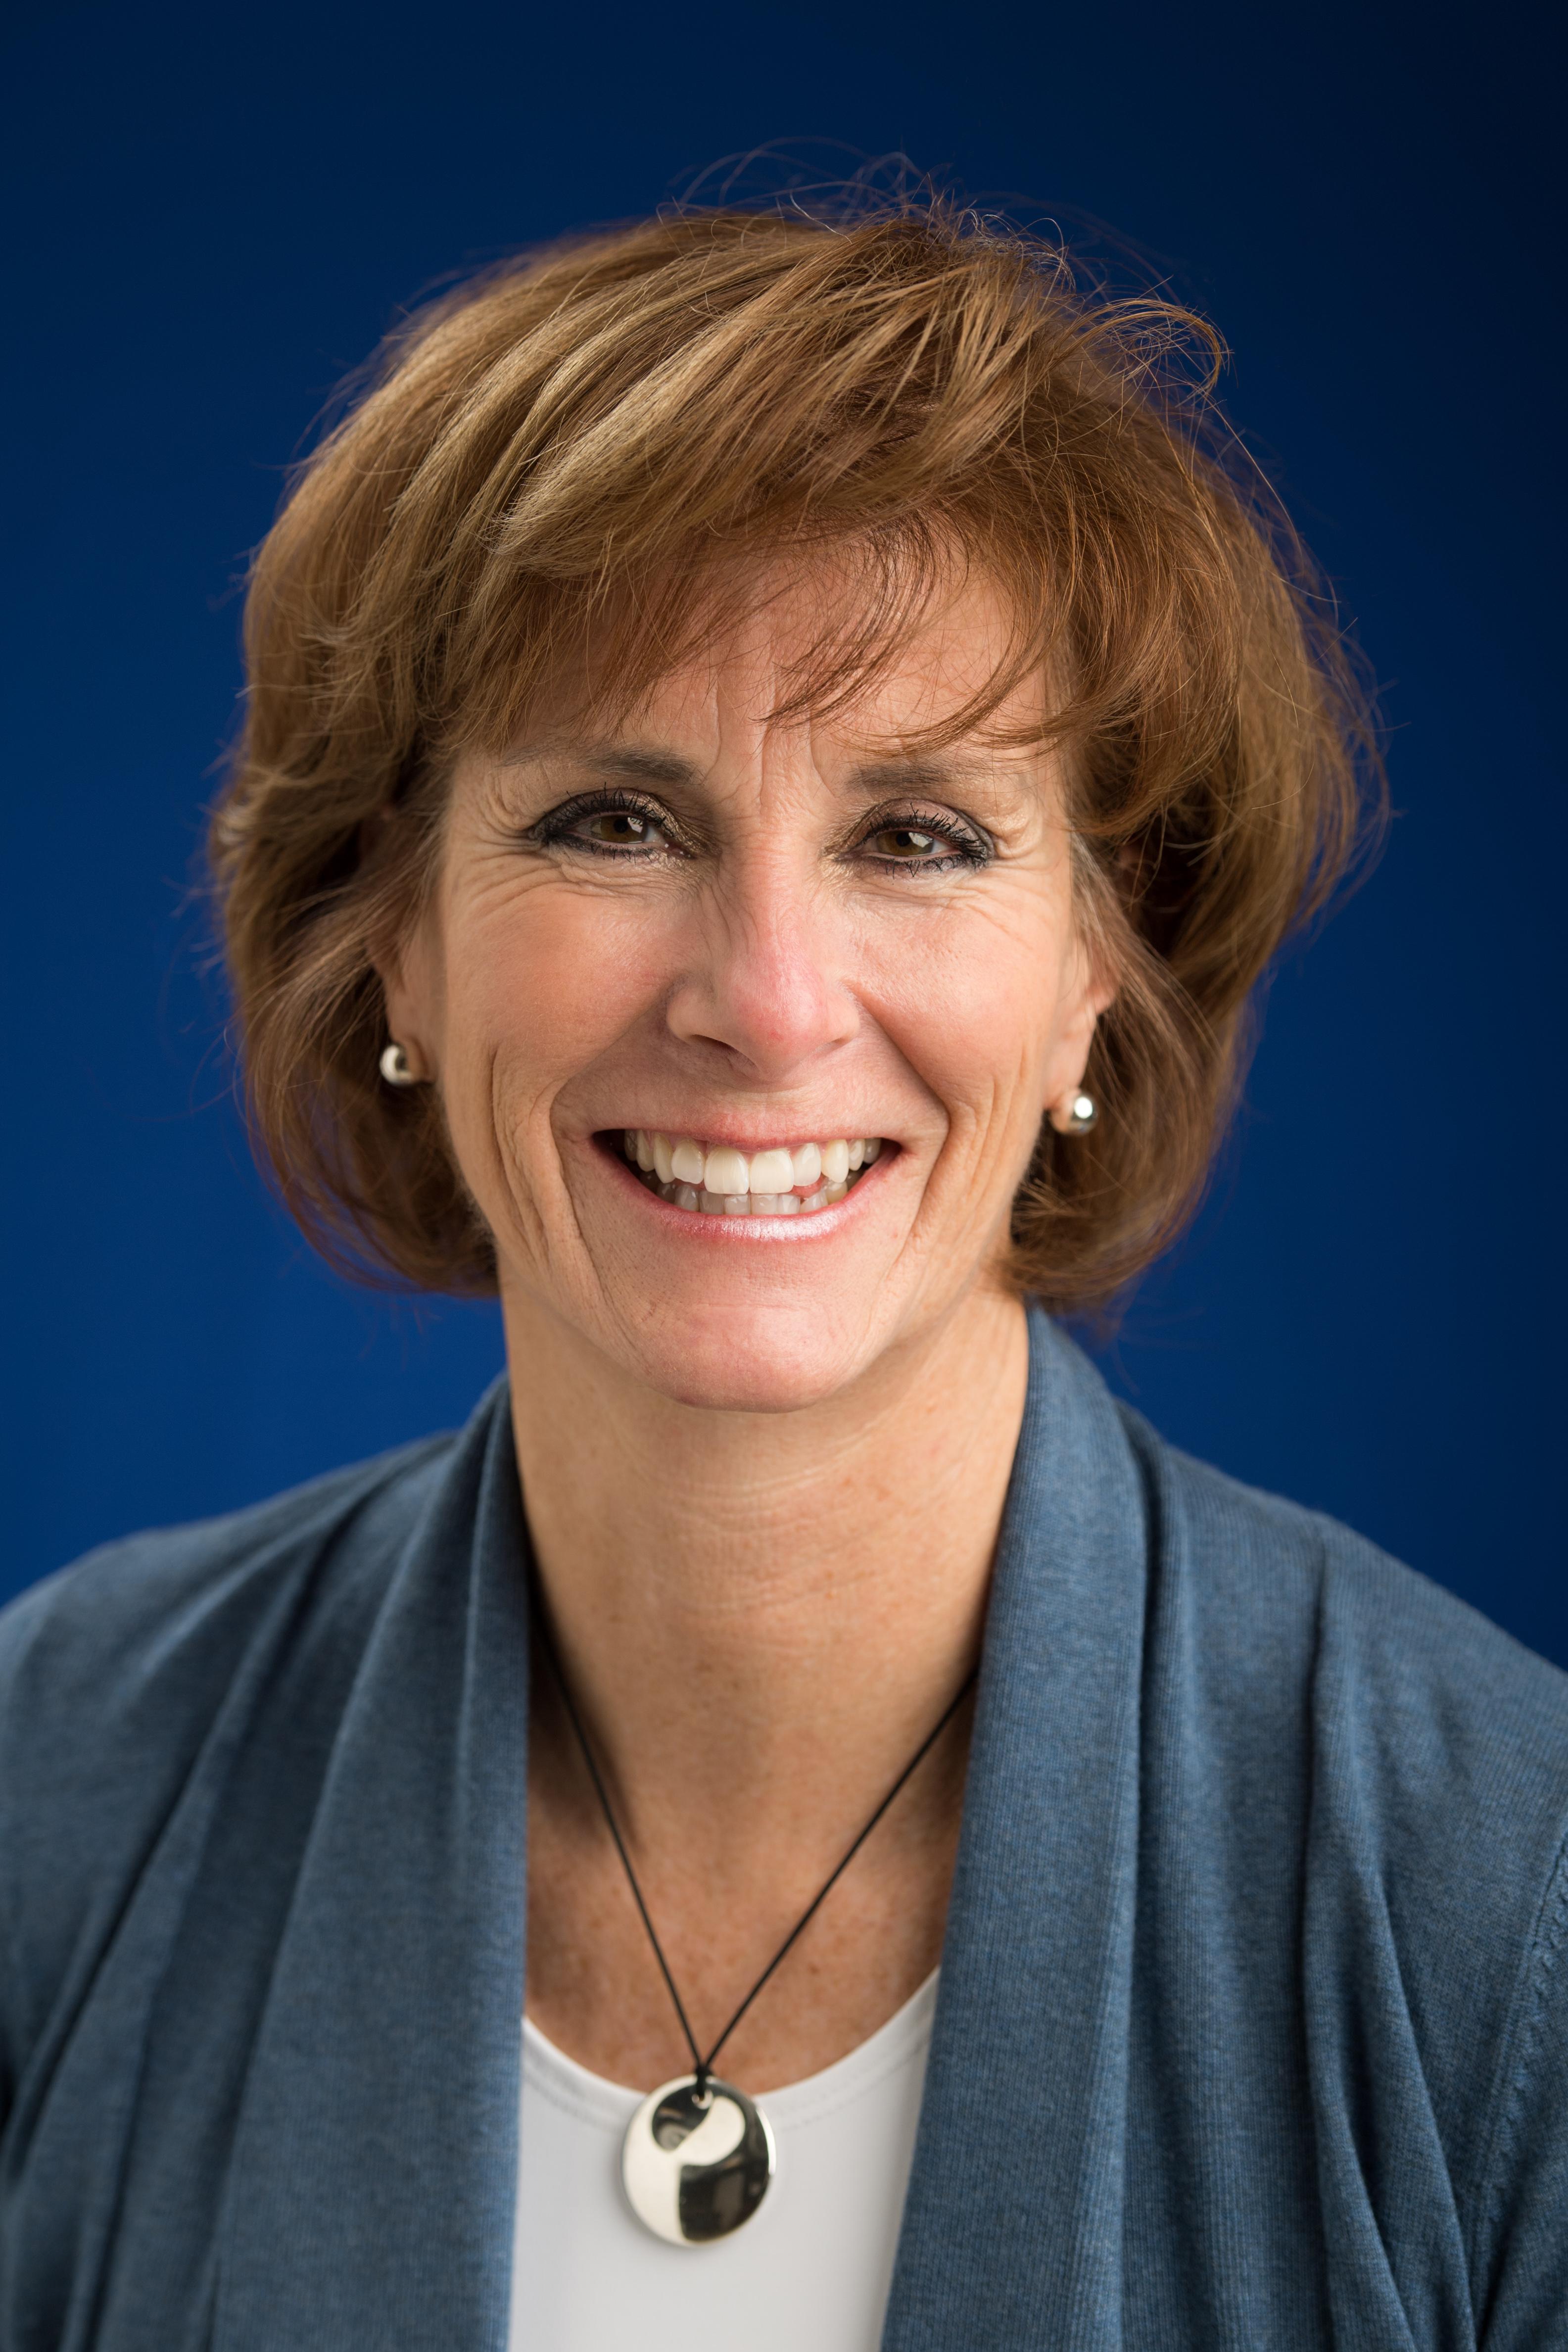 Terrie Holewinski, MS, RDN